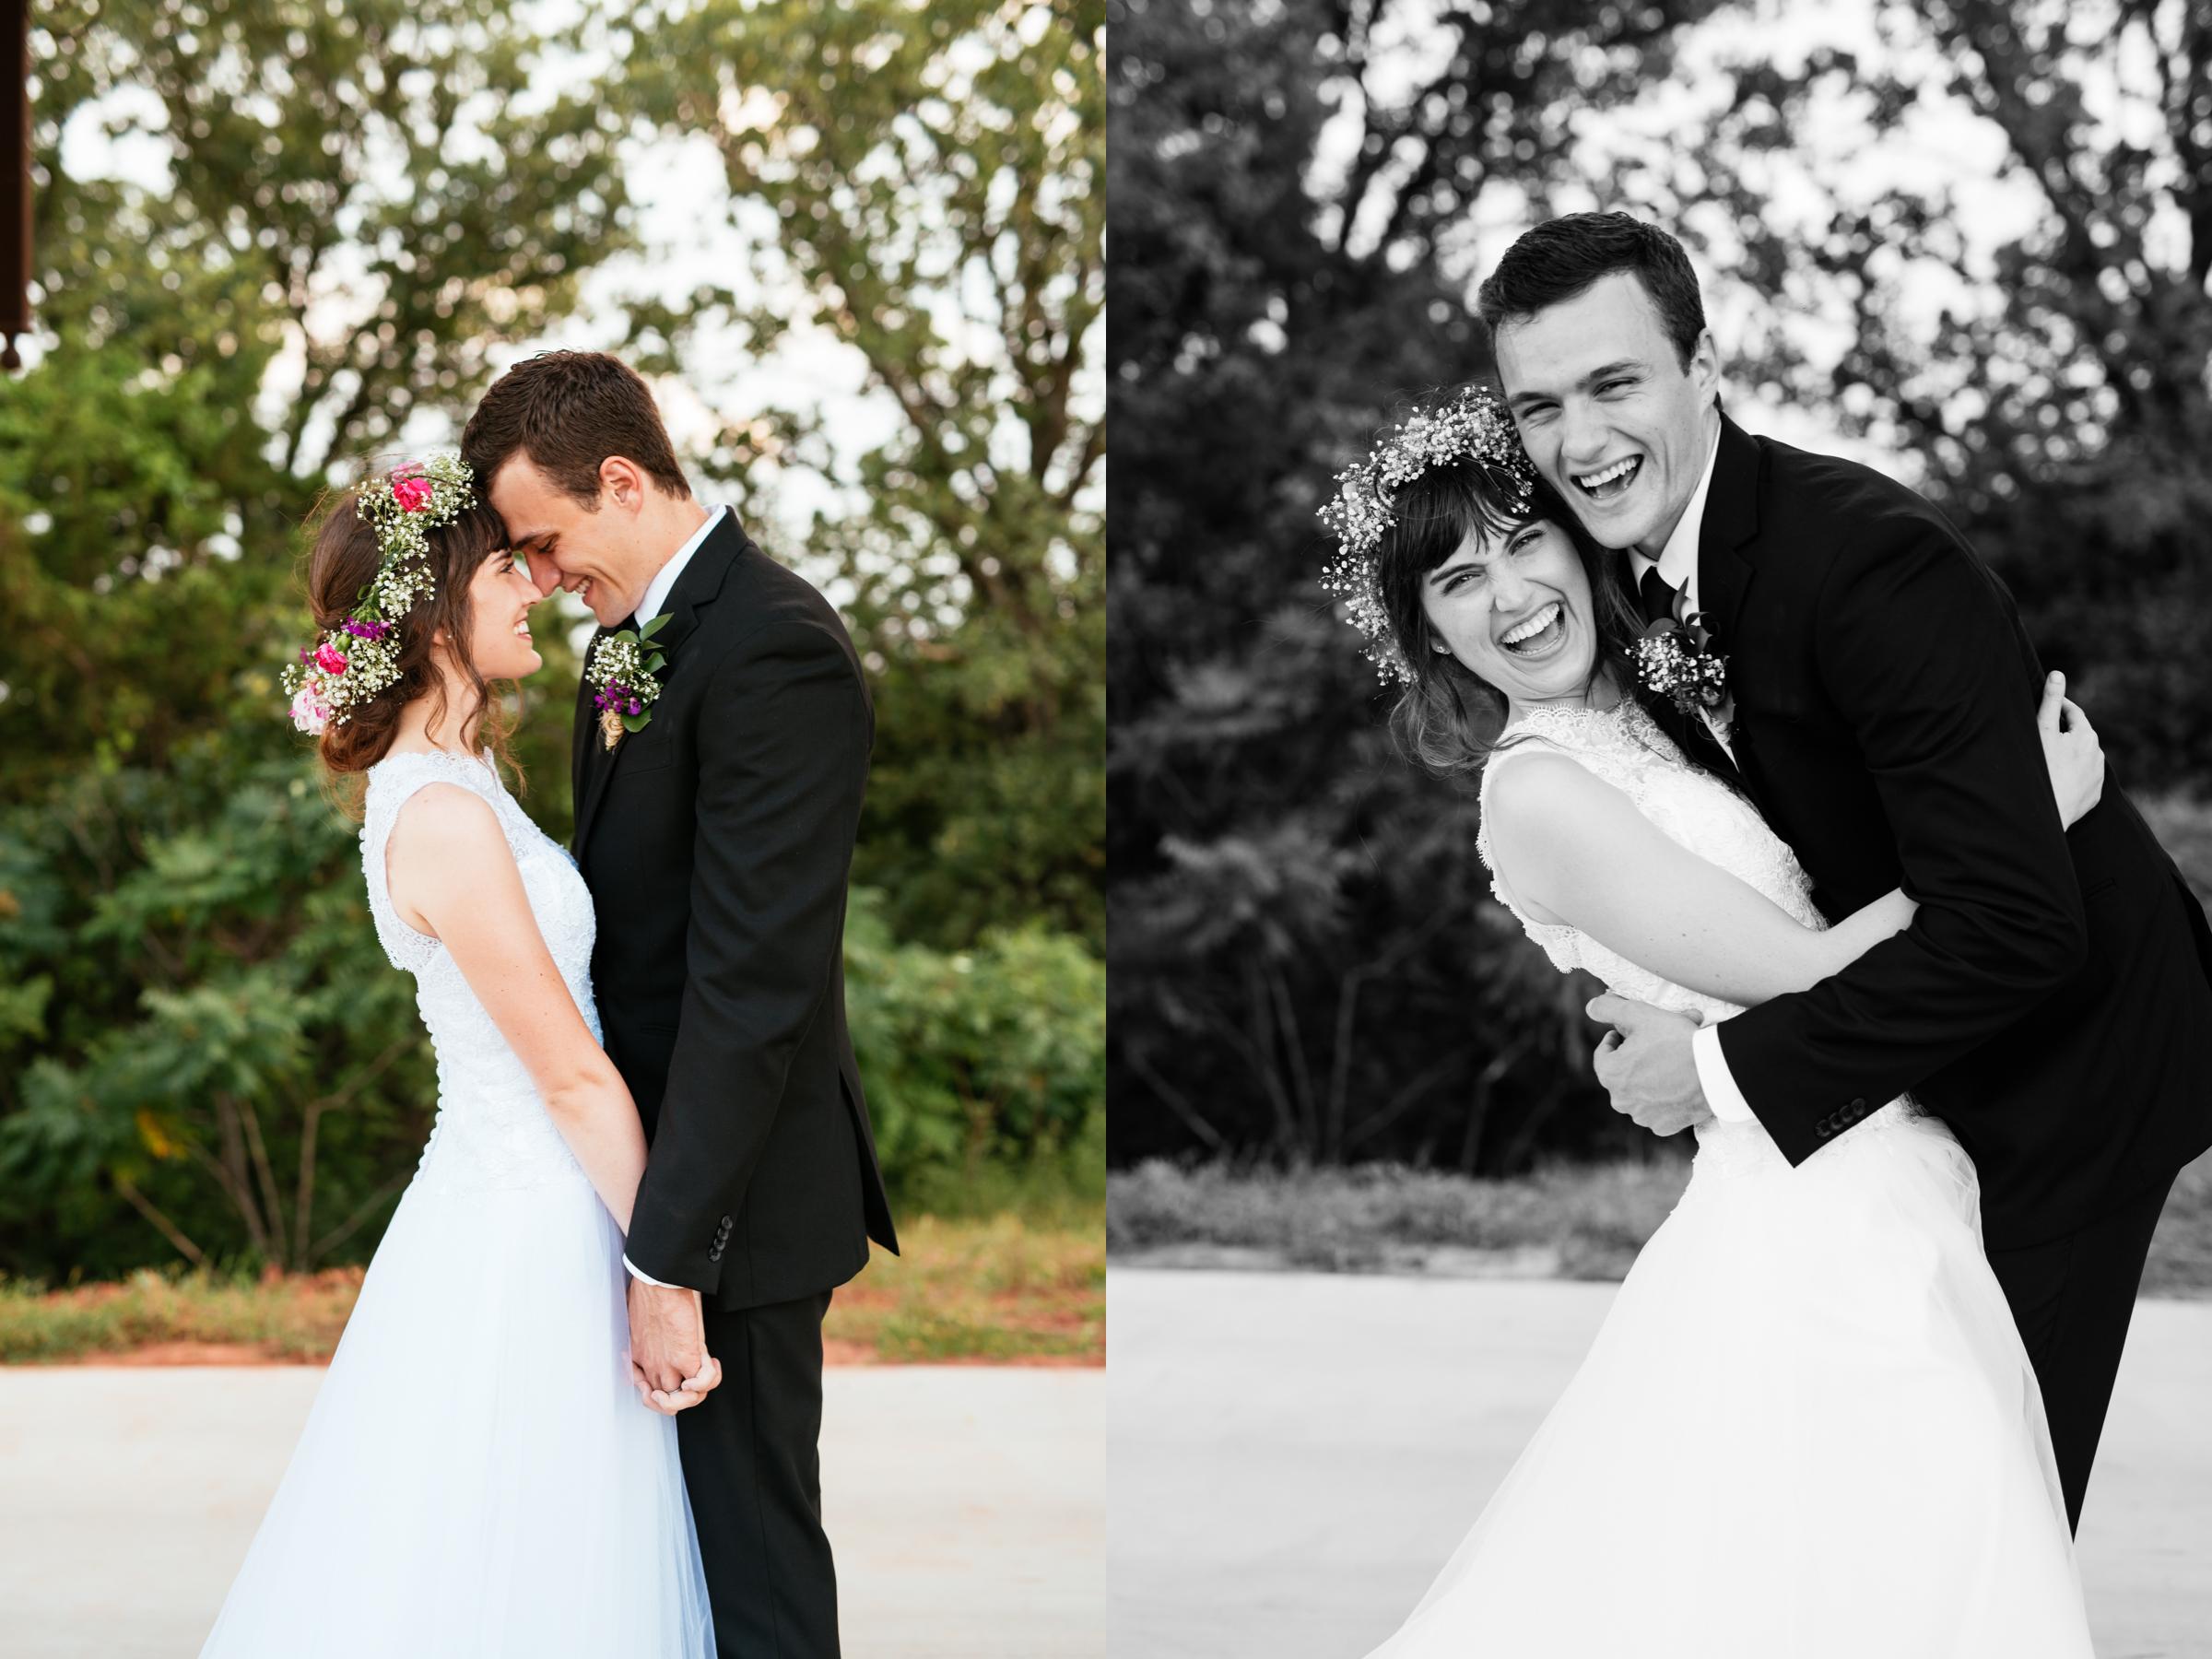 McCurrach Wedding11.jpg